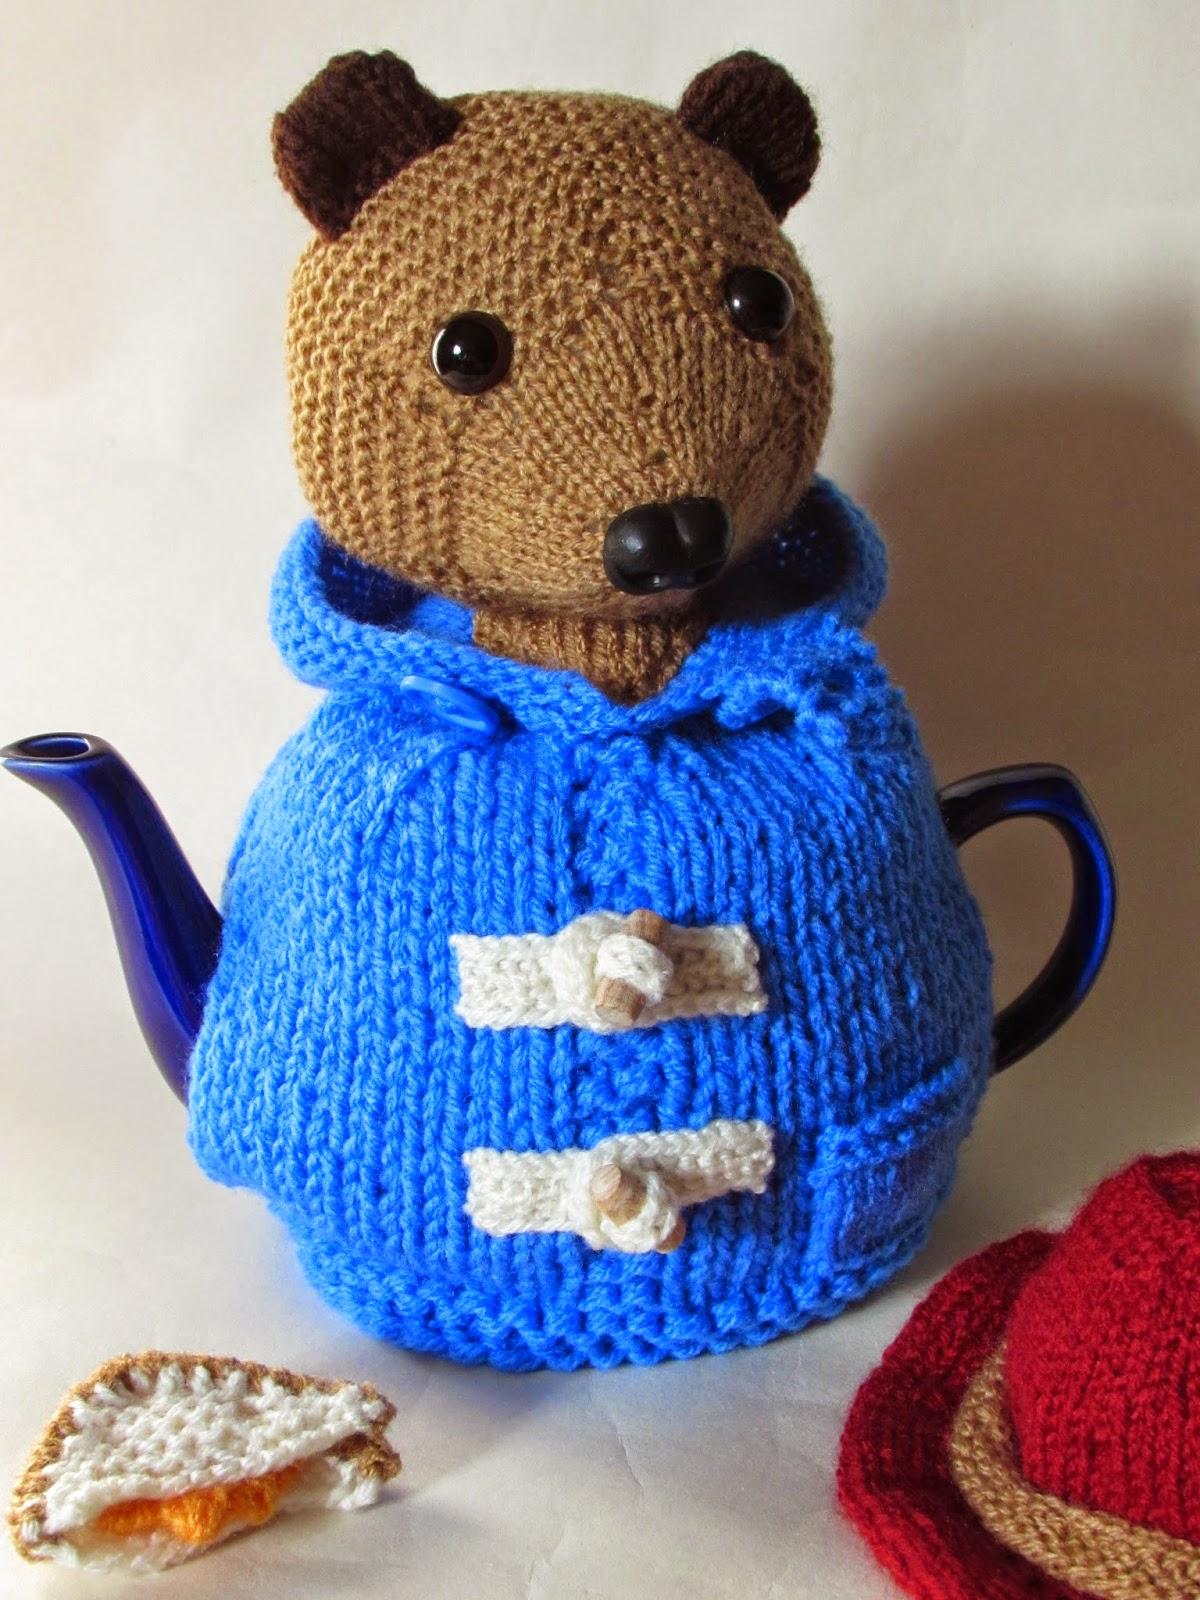 Paddington bear hat crochet pattern manet for paddington bear tea cosy knitting pattern for sale from bankloansurffo Gallery